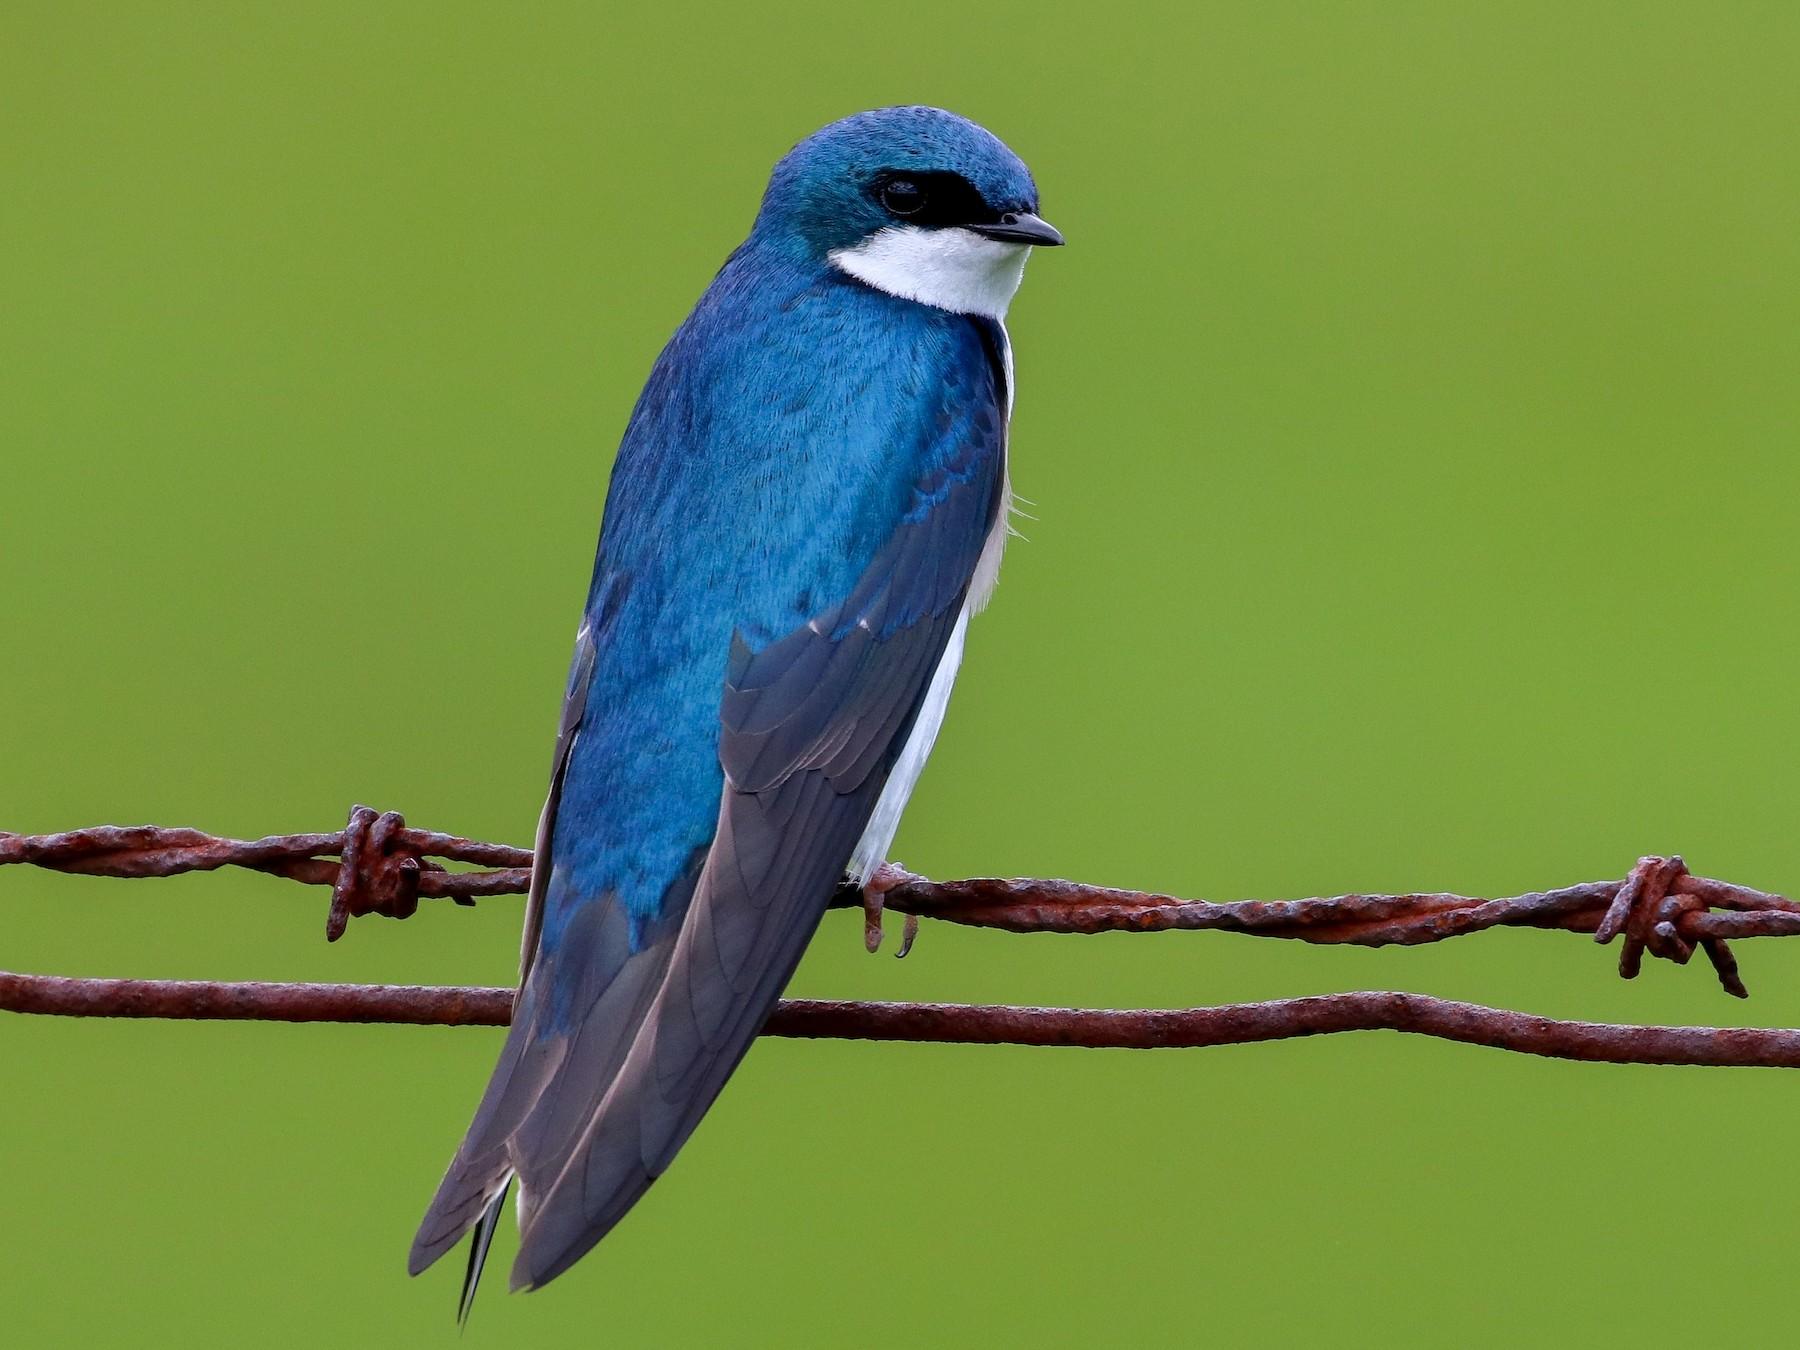 Tree Swallow - Martina Nordstrand